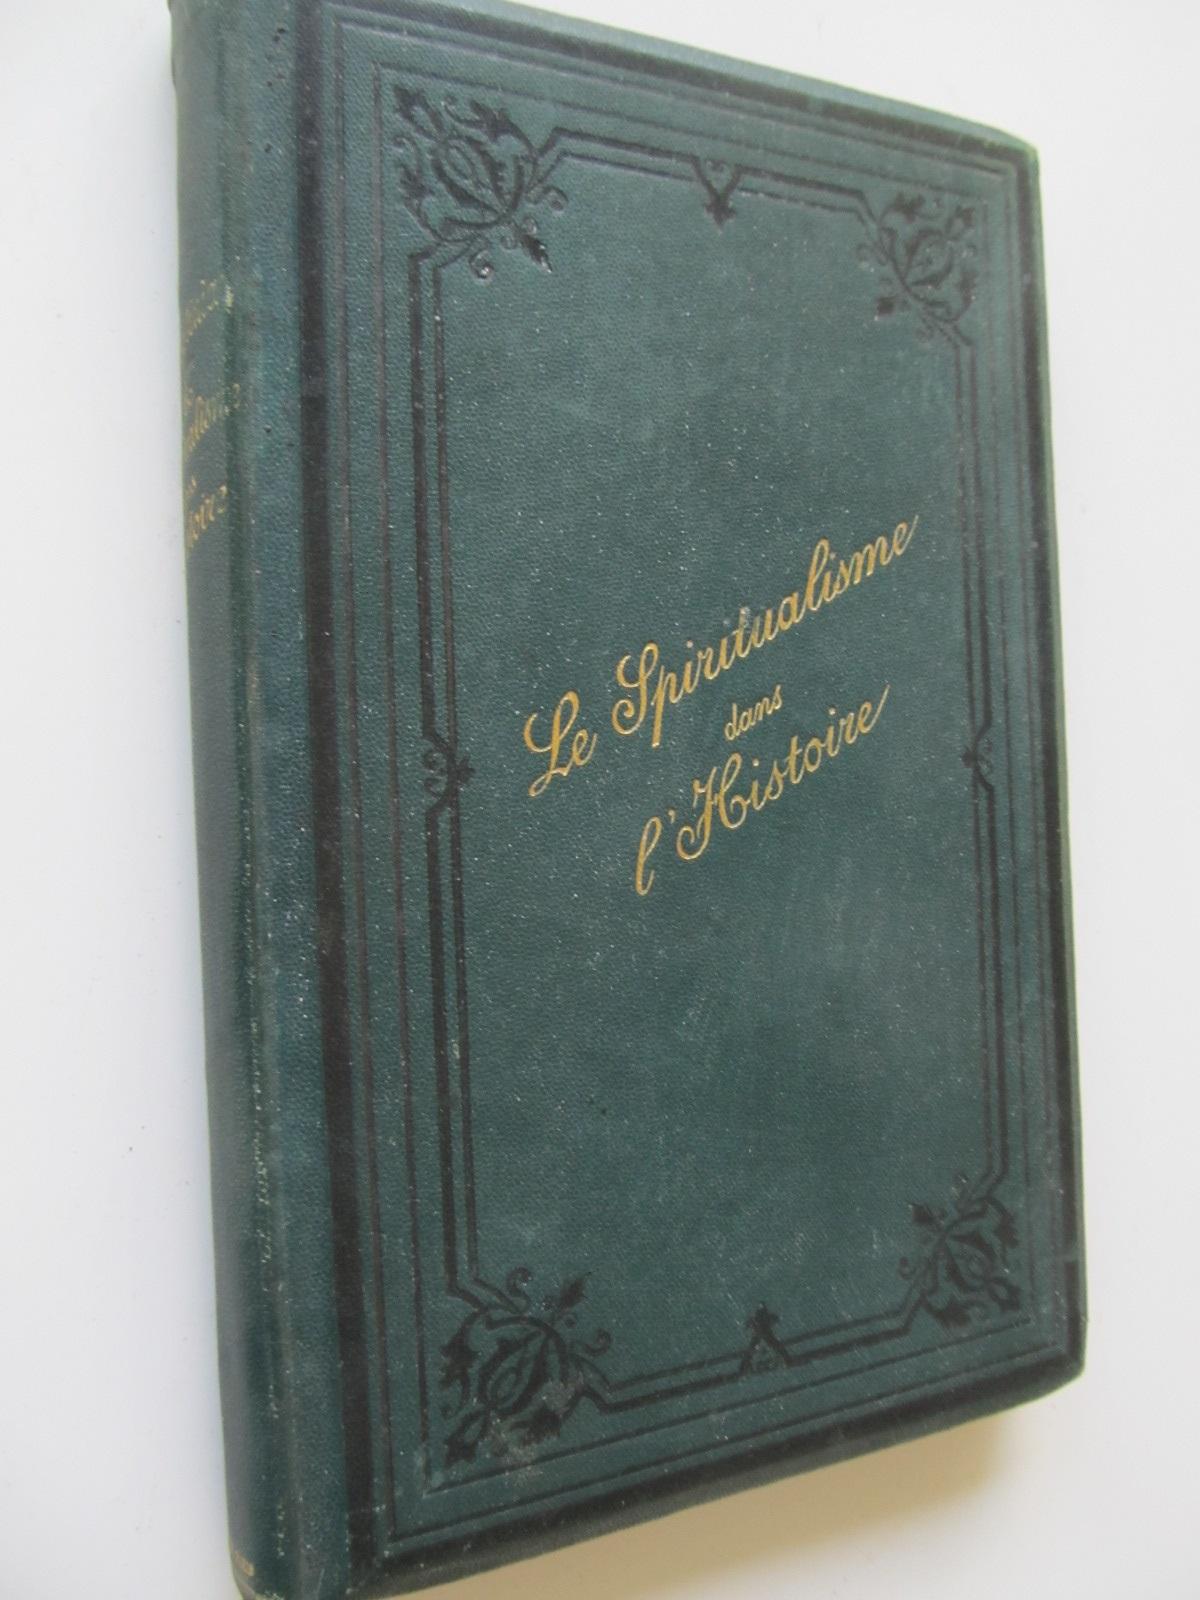 Le Spiritualisme dans l'histoire , 1870 - Rossi de Giustiniani | Detalii carte